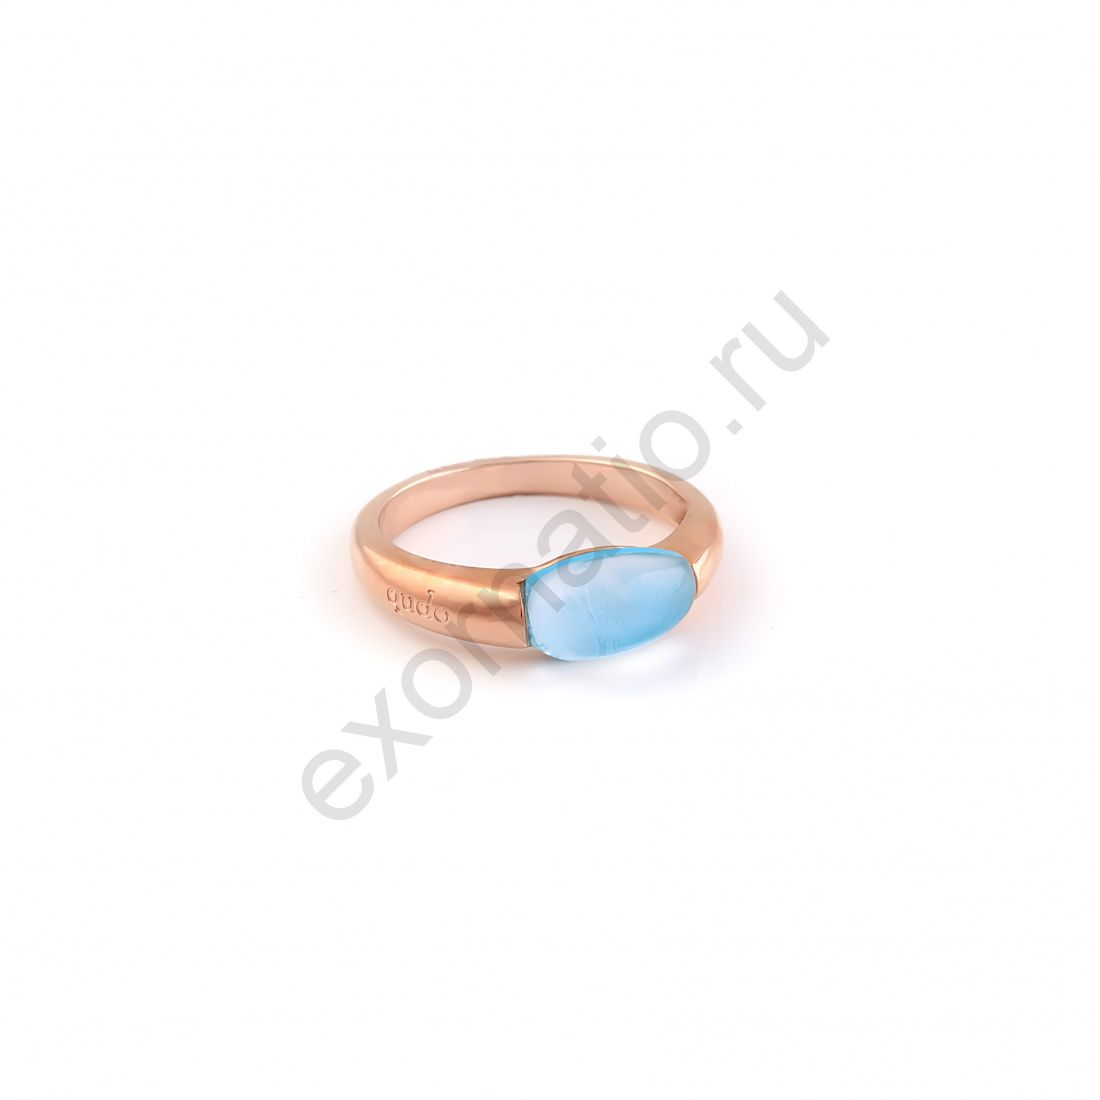 Кольцо Qudo 626335/17.2 BL/RG